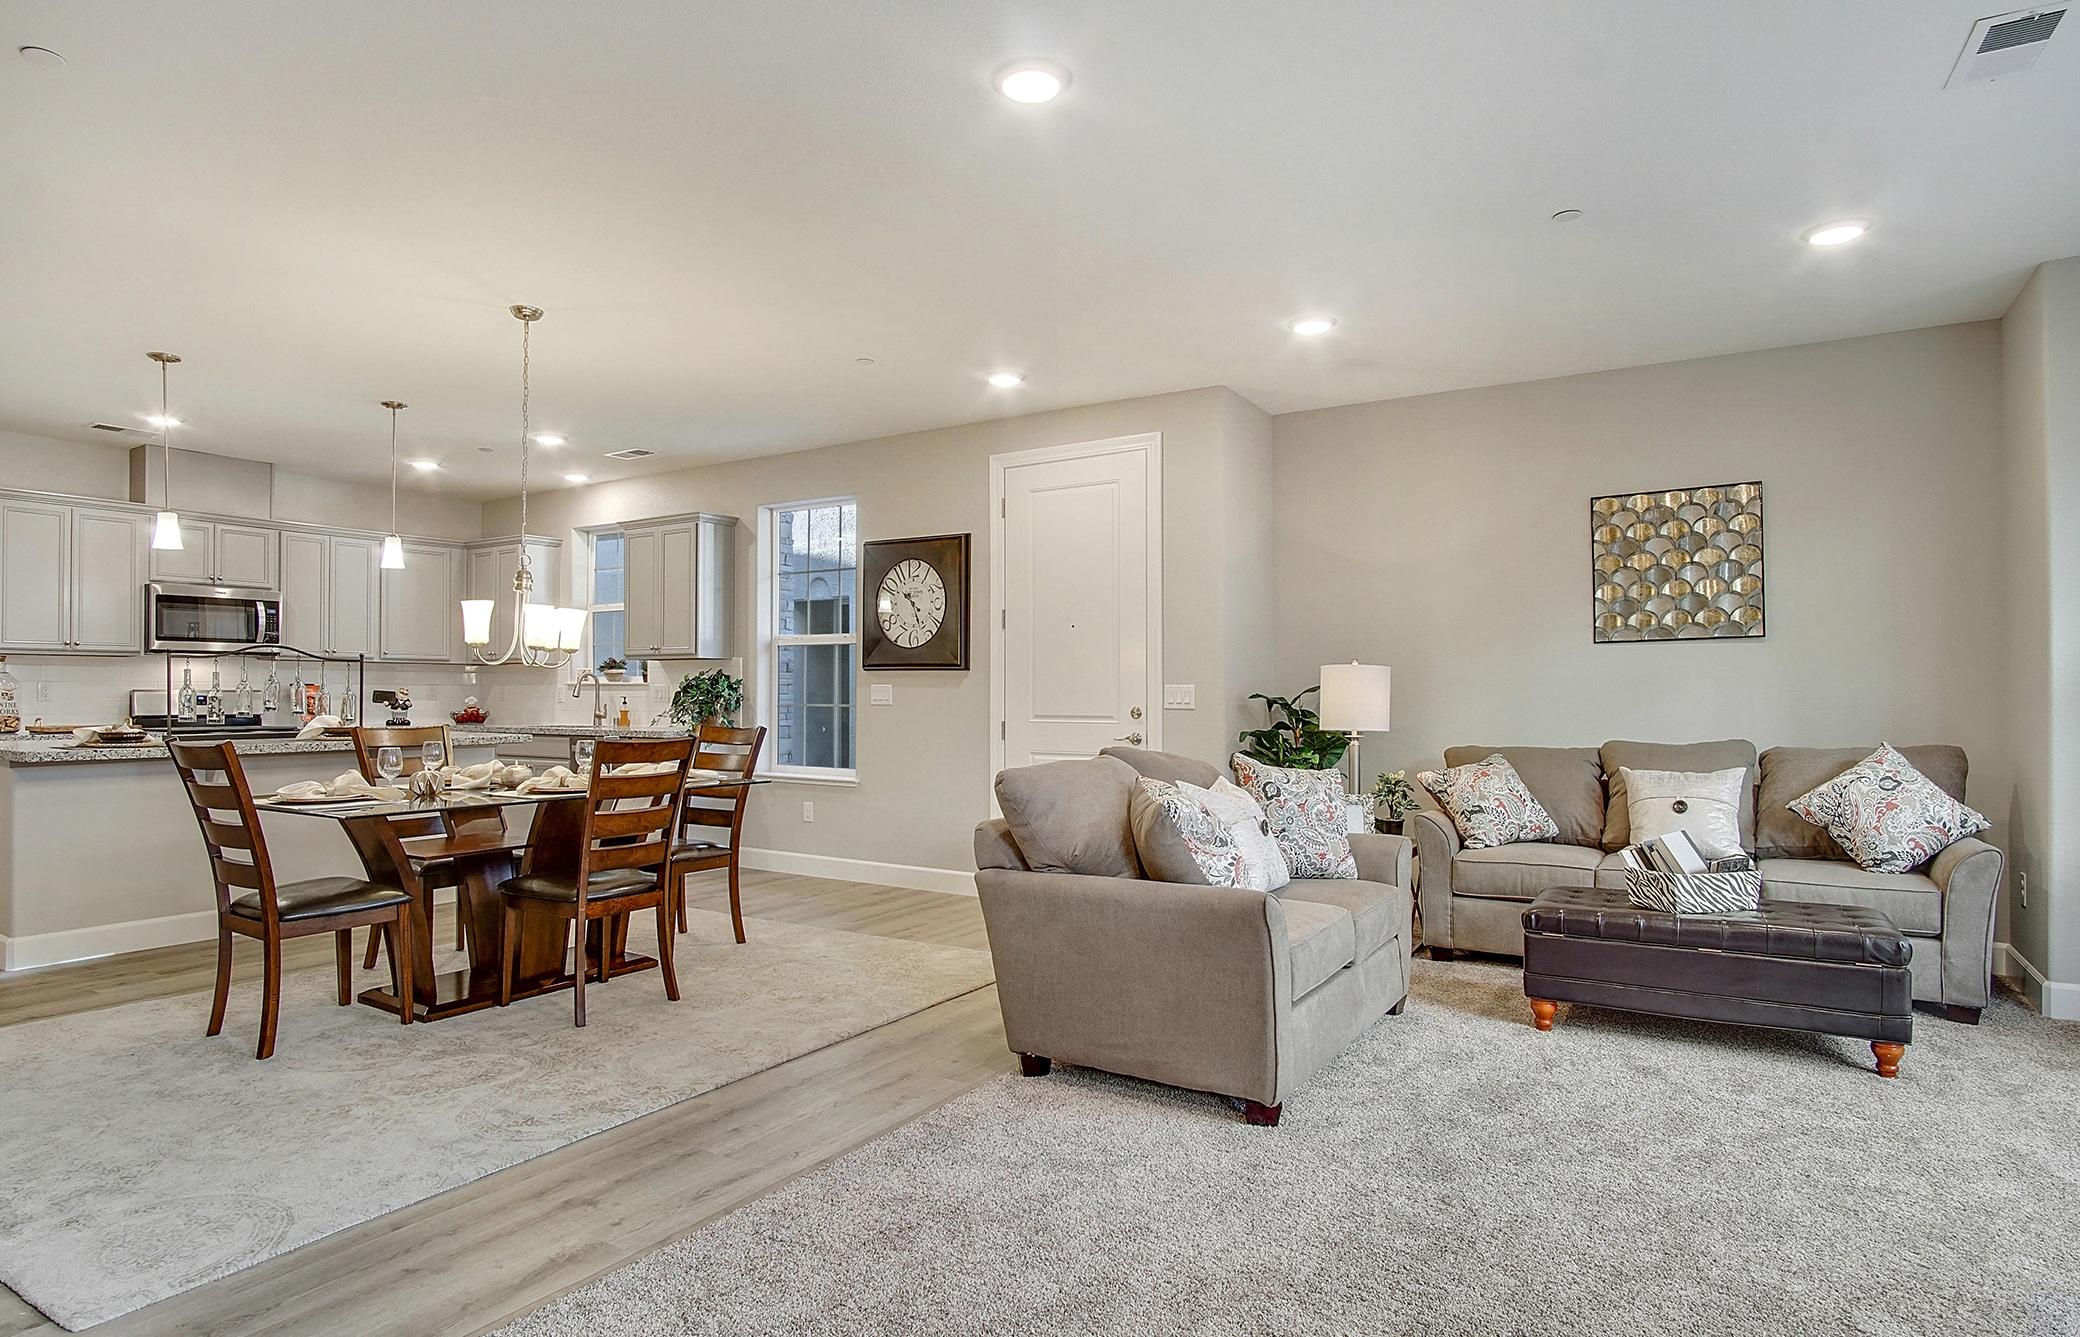 village reno nv living room